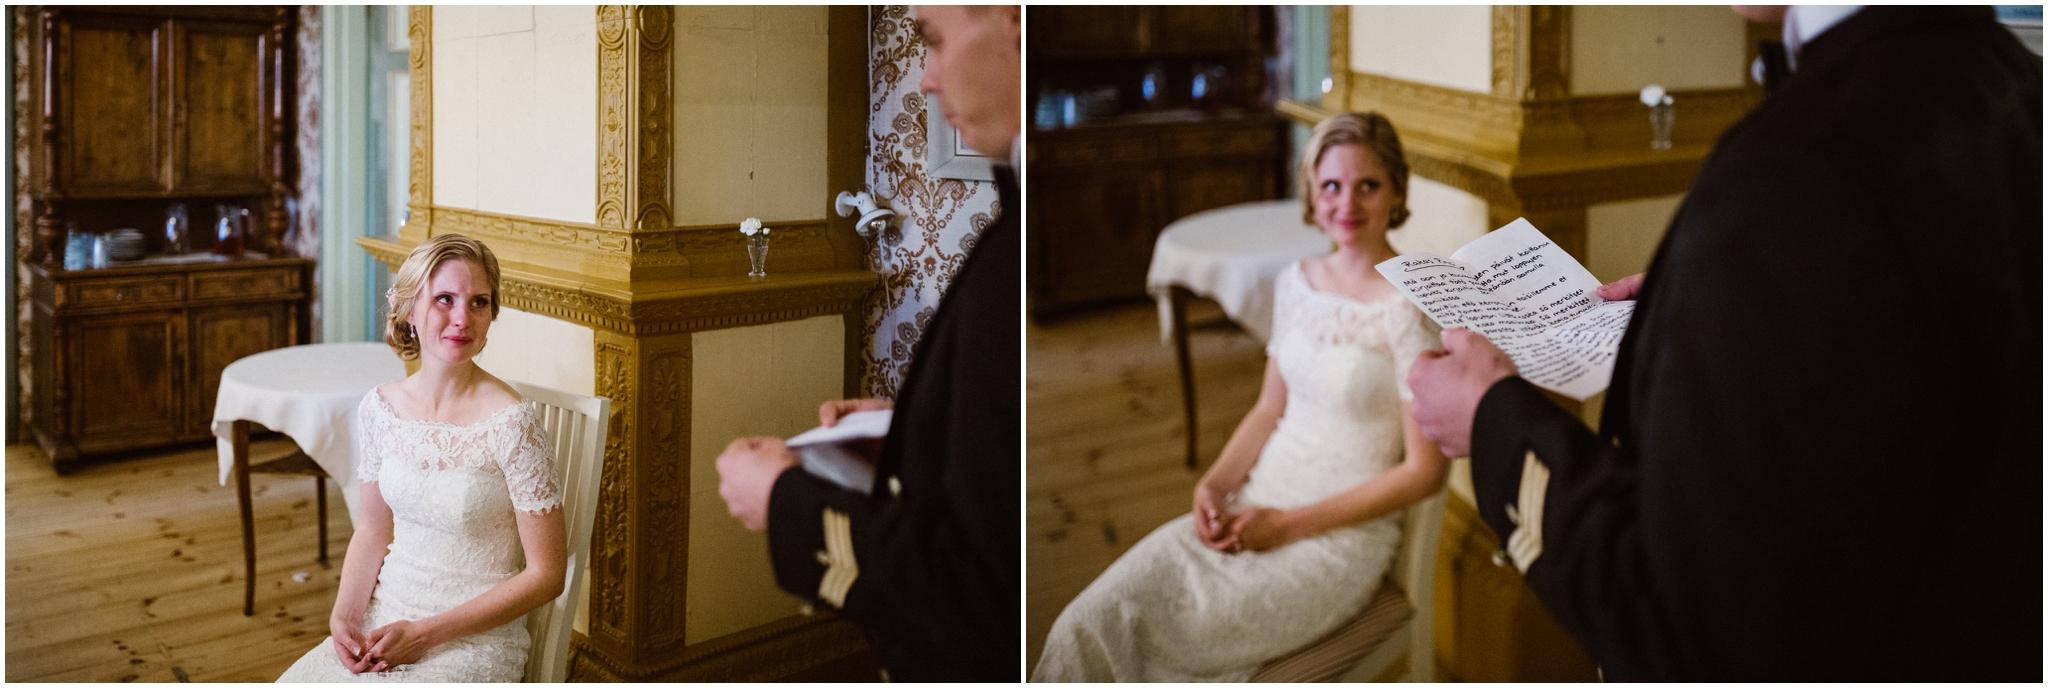 Pinja + Marko -- Patrick Karkkolainen Wedding Photographer-177.jpg